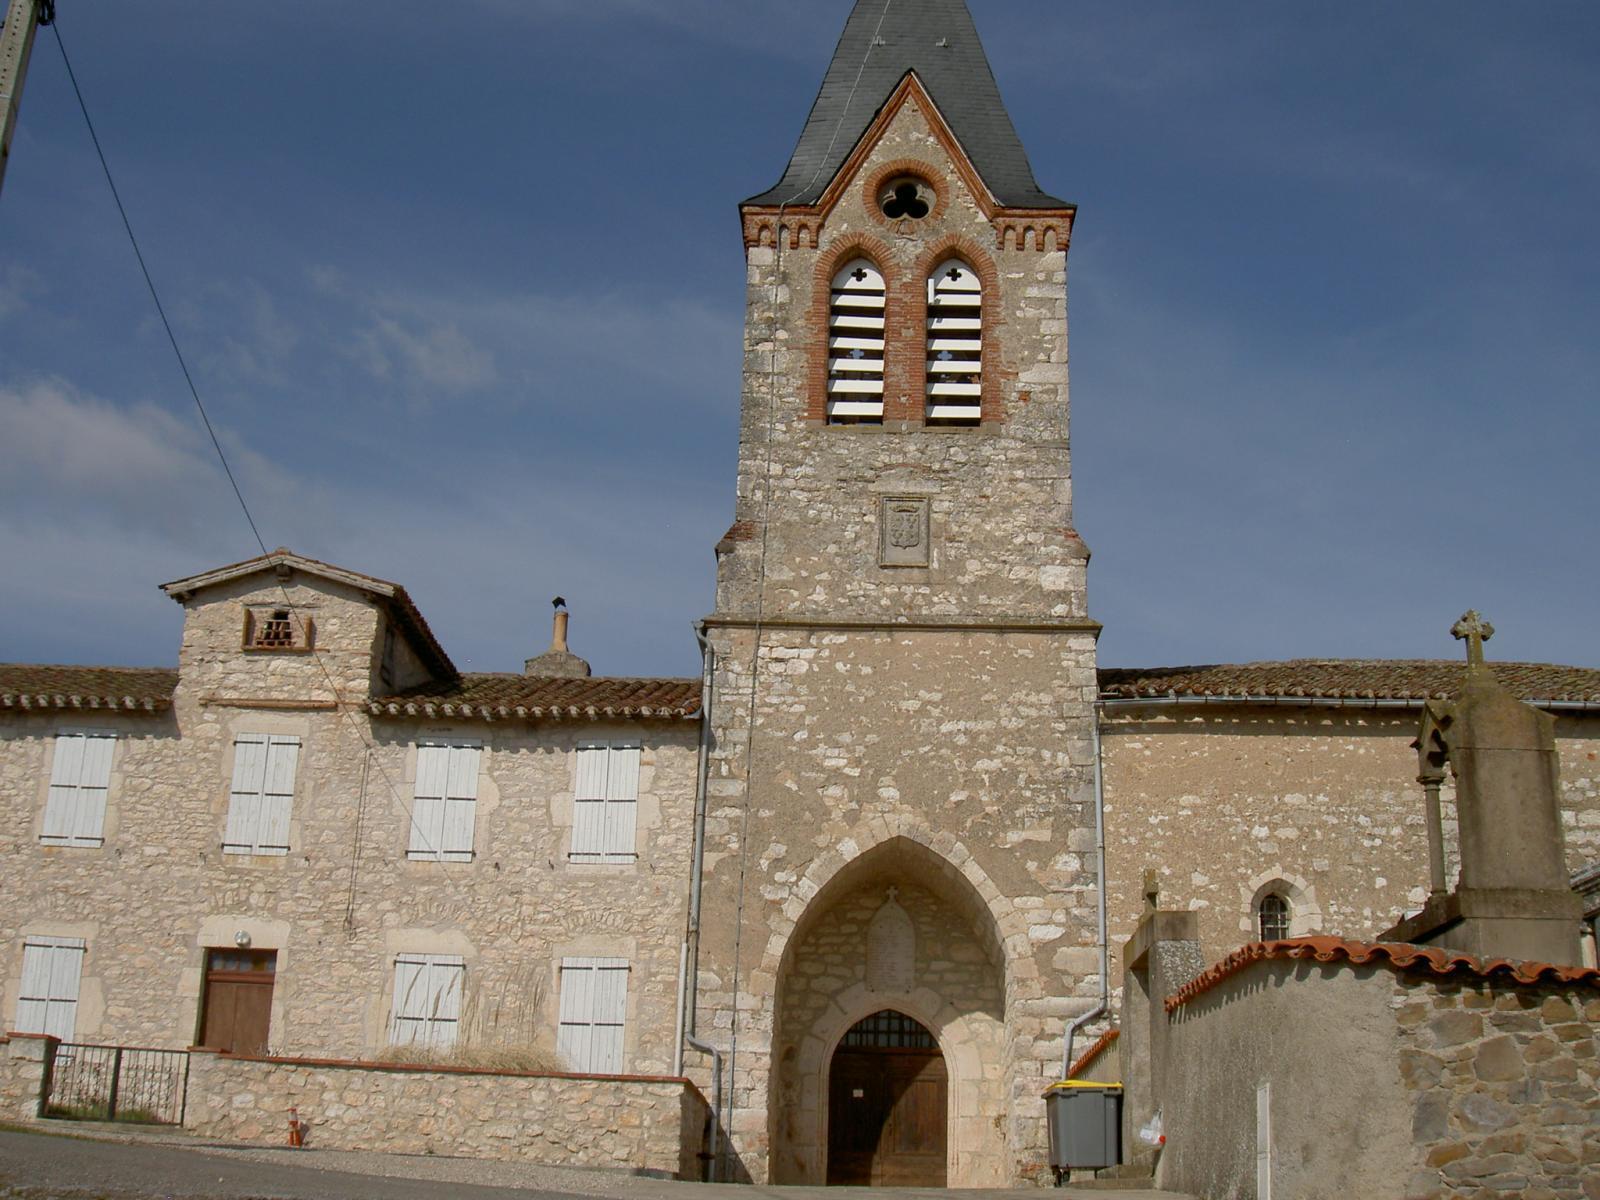 l'Eglise de Pouzounnac